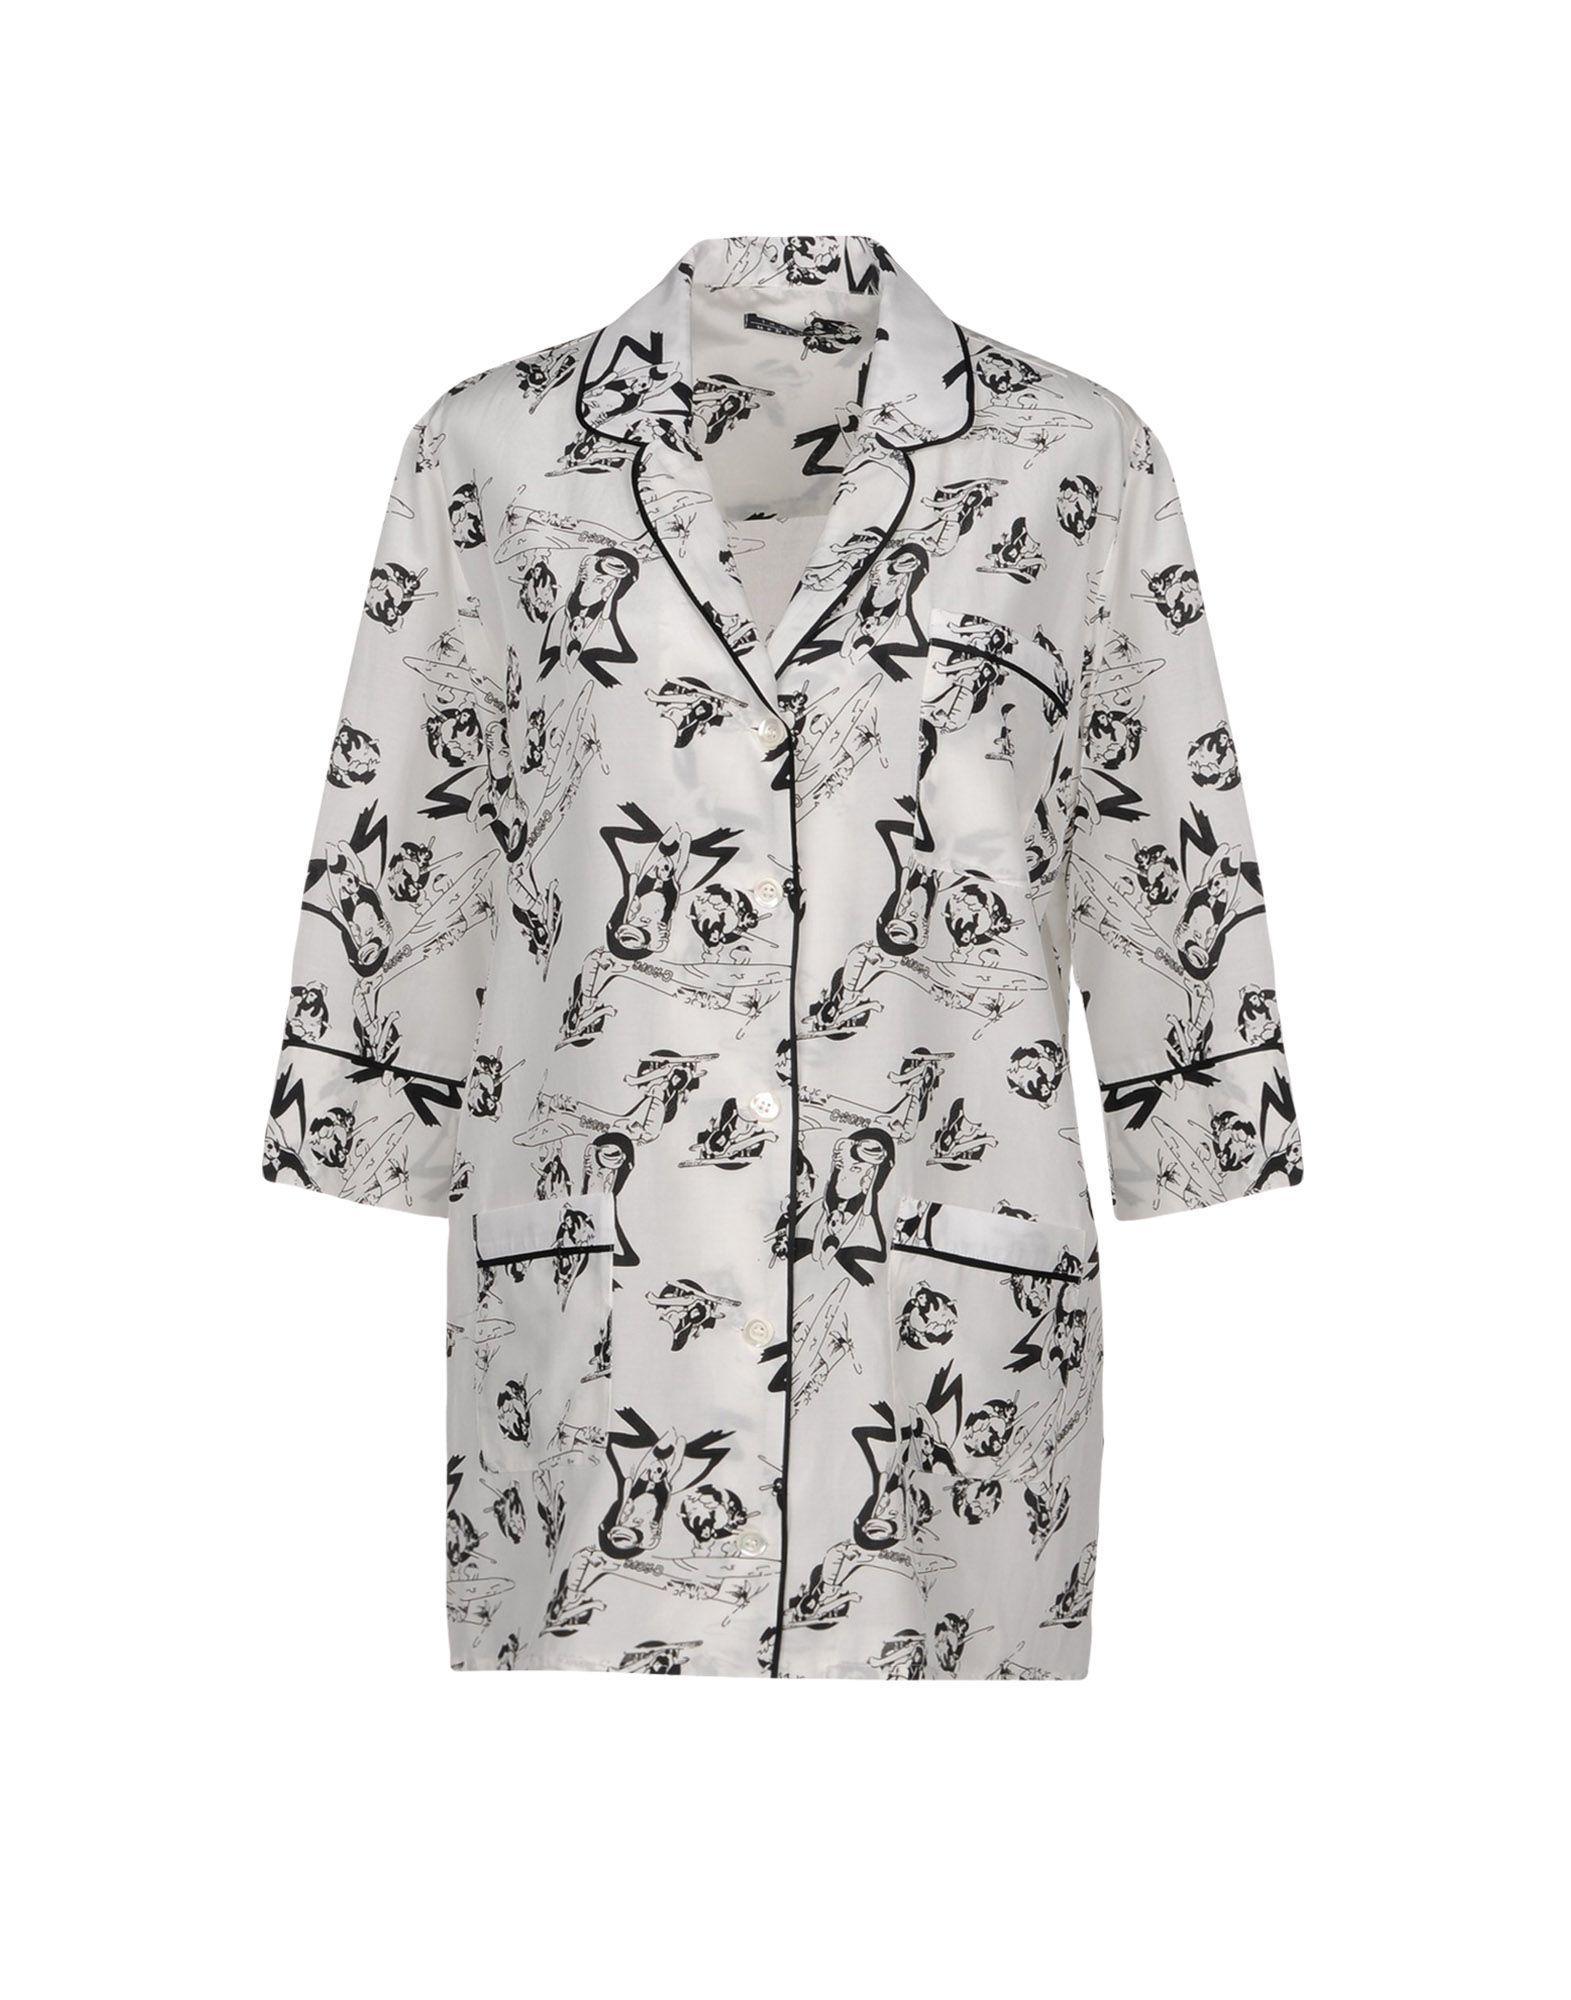 Limited Edition For Sale New SHIRTS - Shirts Laura Urbinati QWGfnqrsa